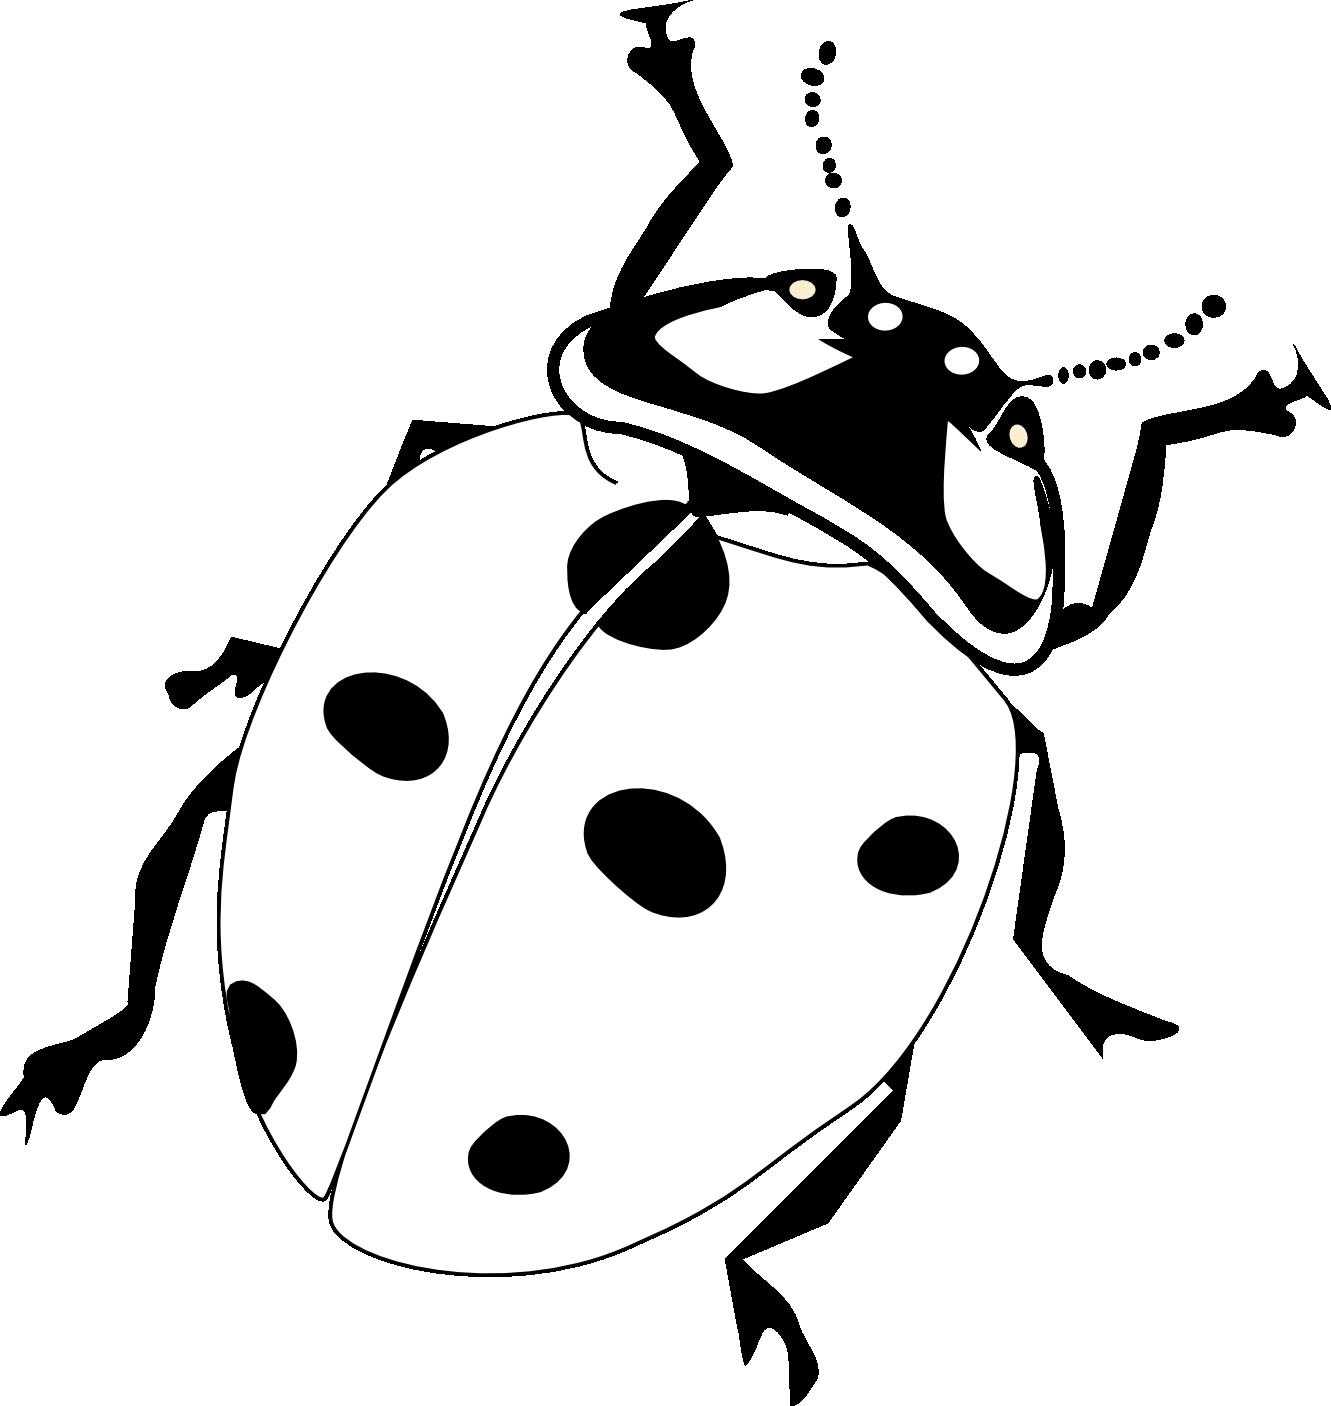 Flower tattoo clipart graphic Ladybug On Flower Tattoo | Clipart Panda - Free Clipart Images graphic